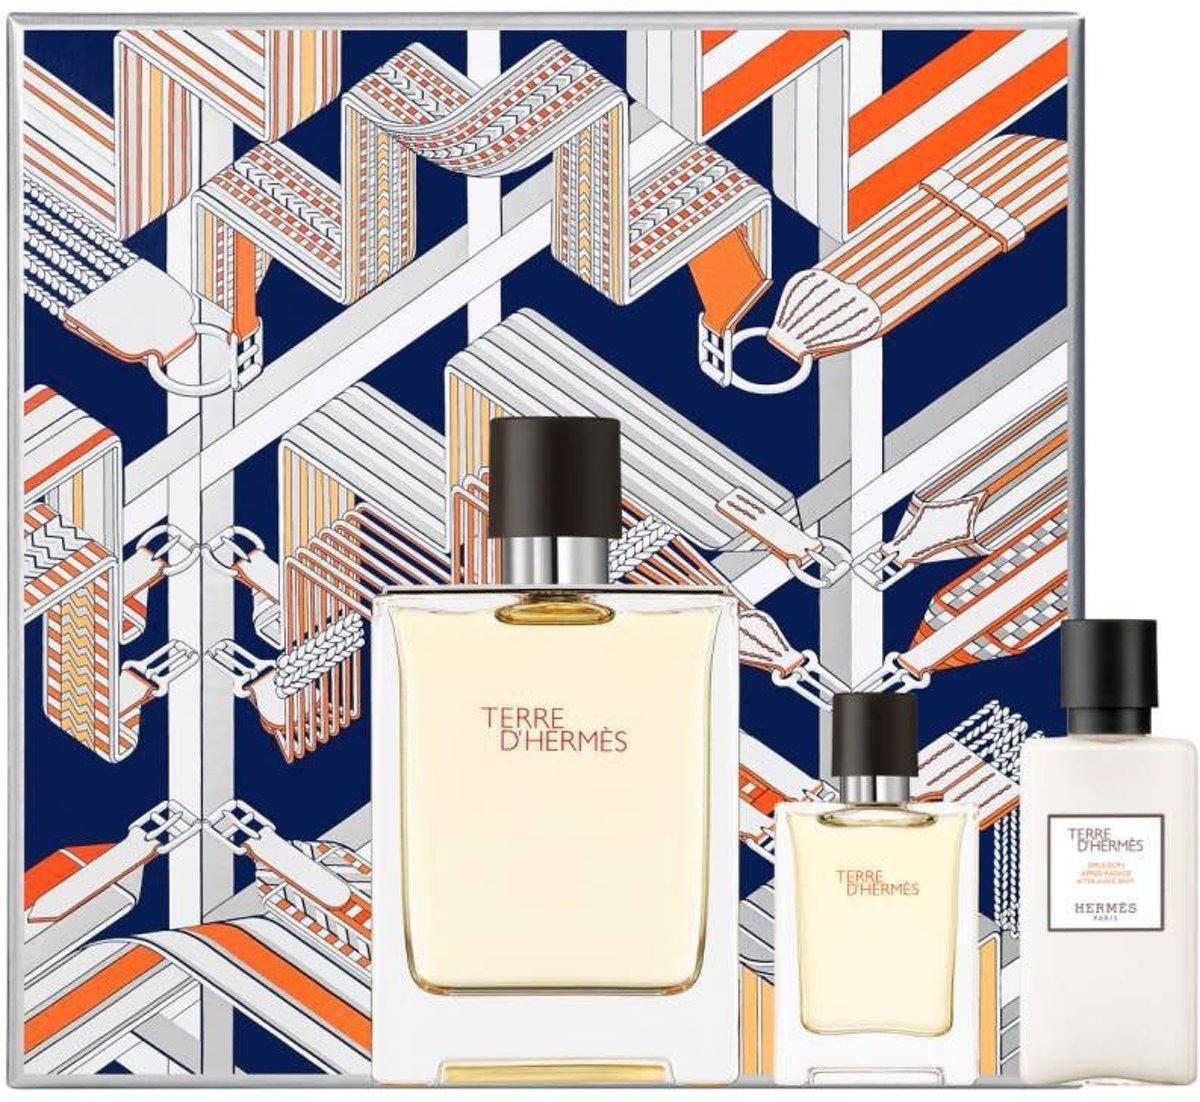 Hermes Geschenkset Terre Dhermes 100 Ml 40 125 D Eau Tres Fraiche For Men Edt 125ml Voor Mannen